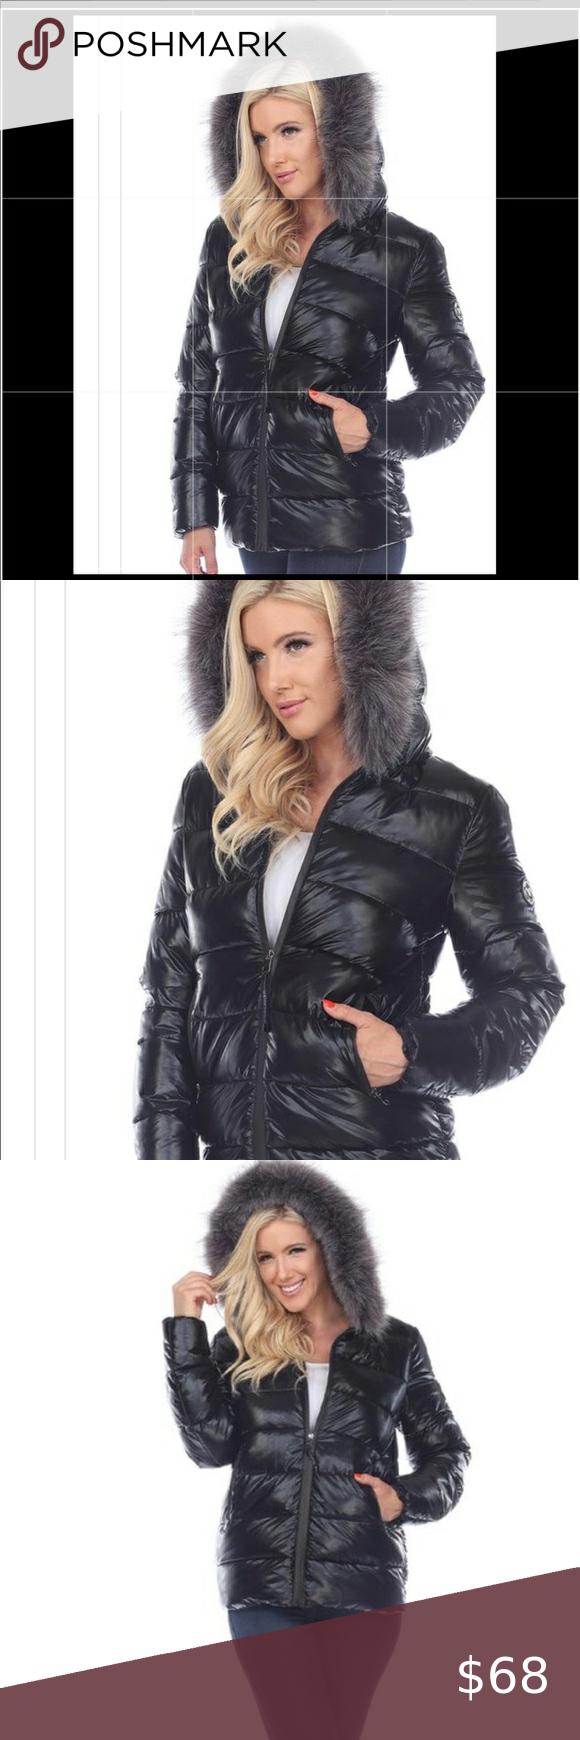 Preorder Now Black Puffer Coat With Hood Preorder This Gorgeous Black Metallic Puffer Jacket With Hood P Puffer Coat With Hood Black Puffer Coat Black Puffer [ 1740 x 580 Pixel ]